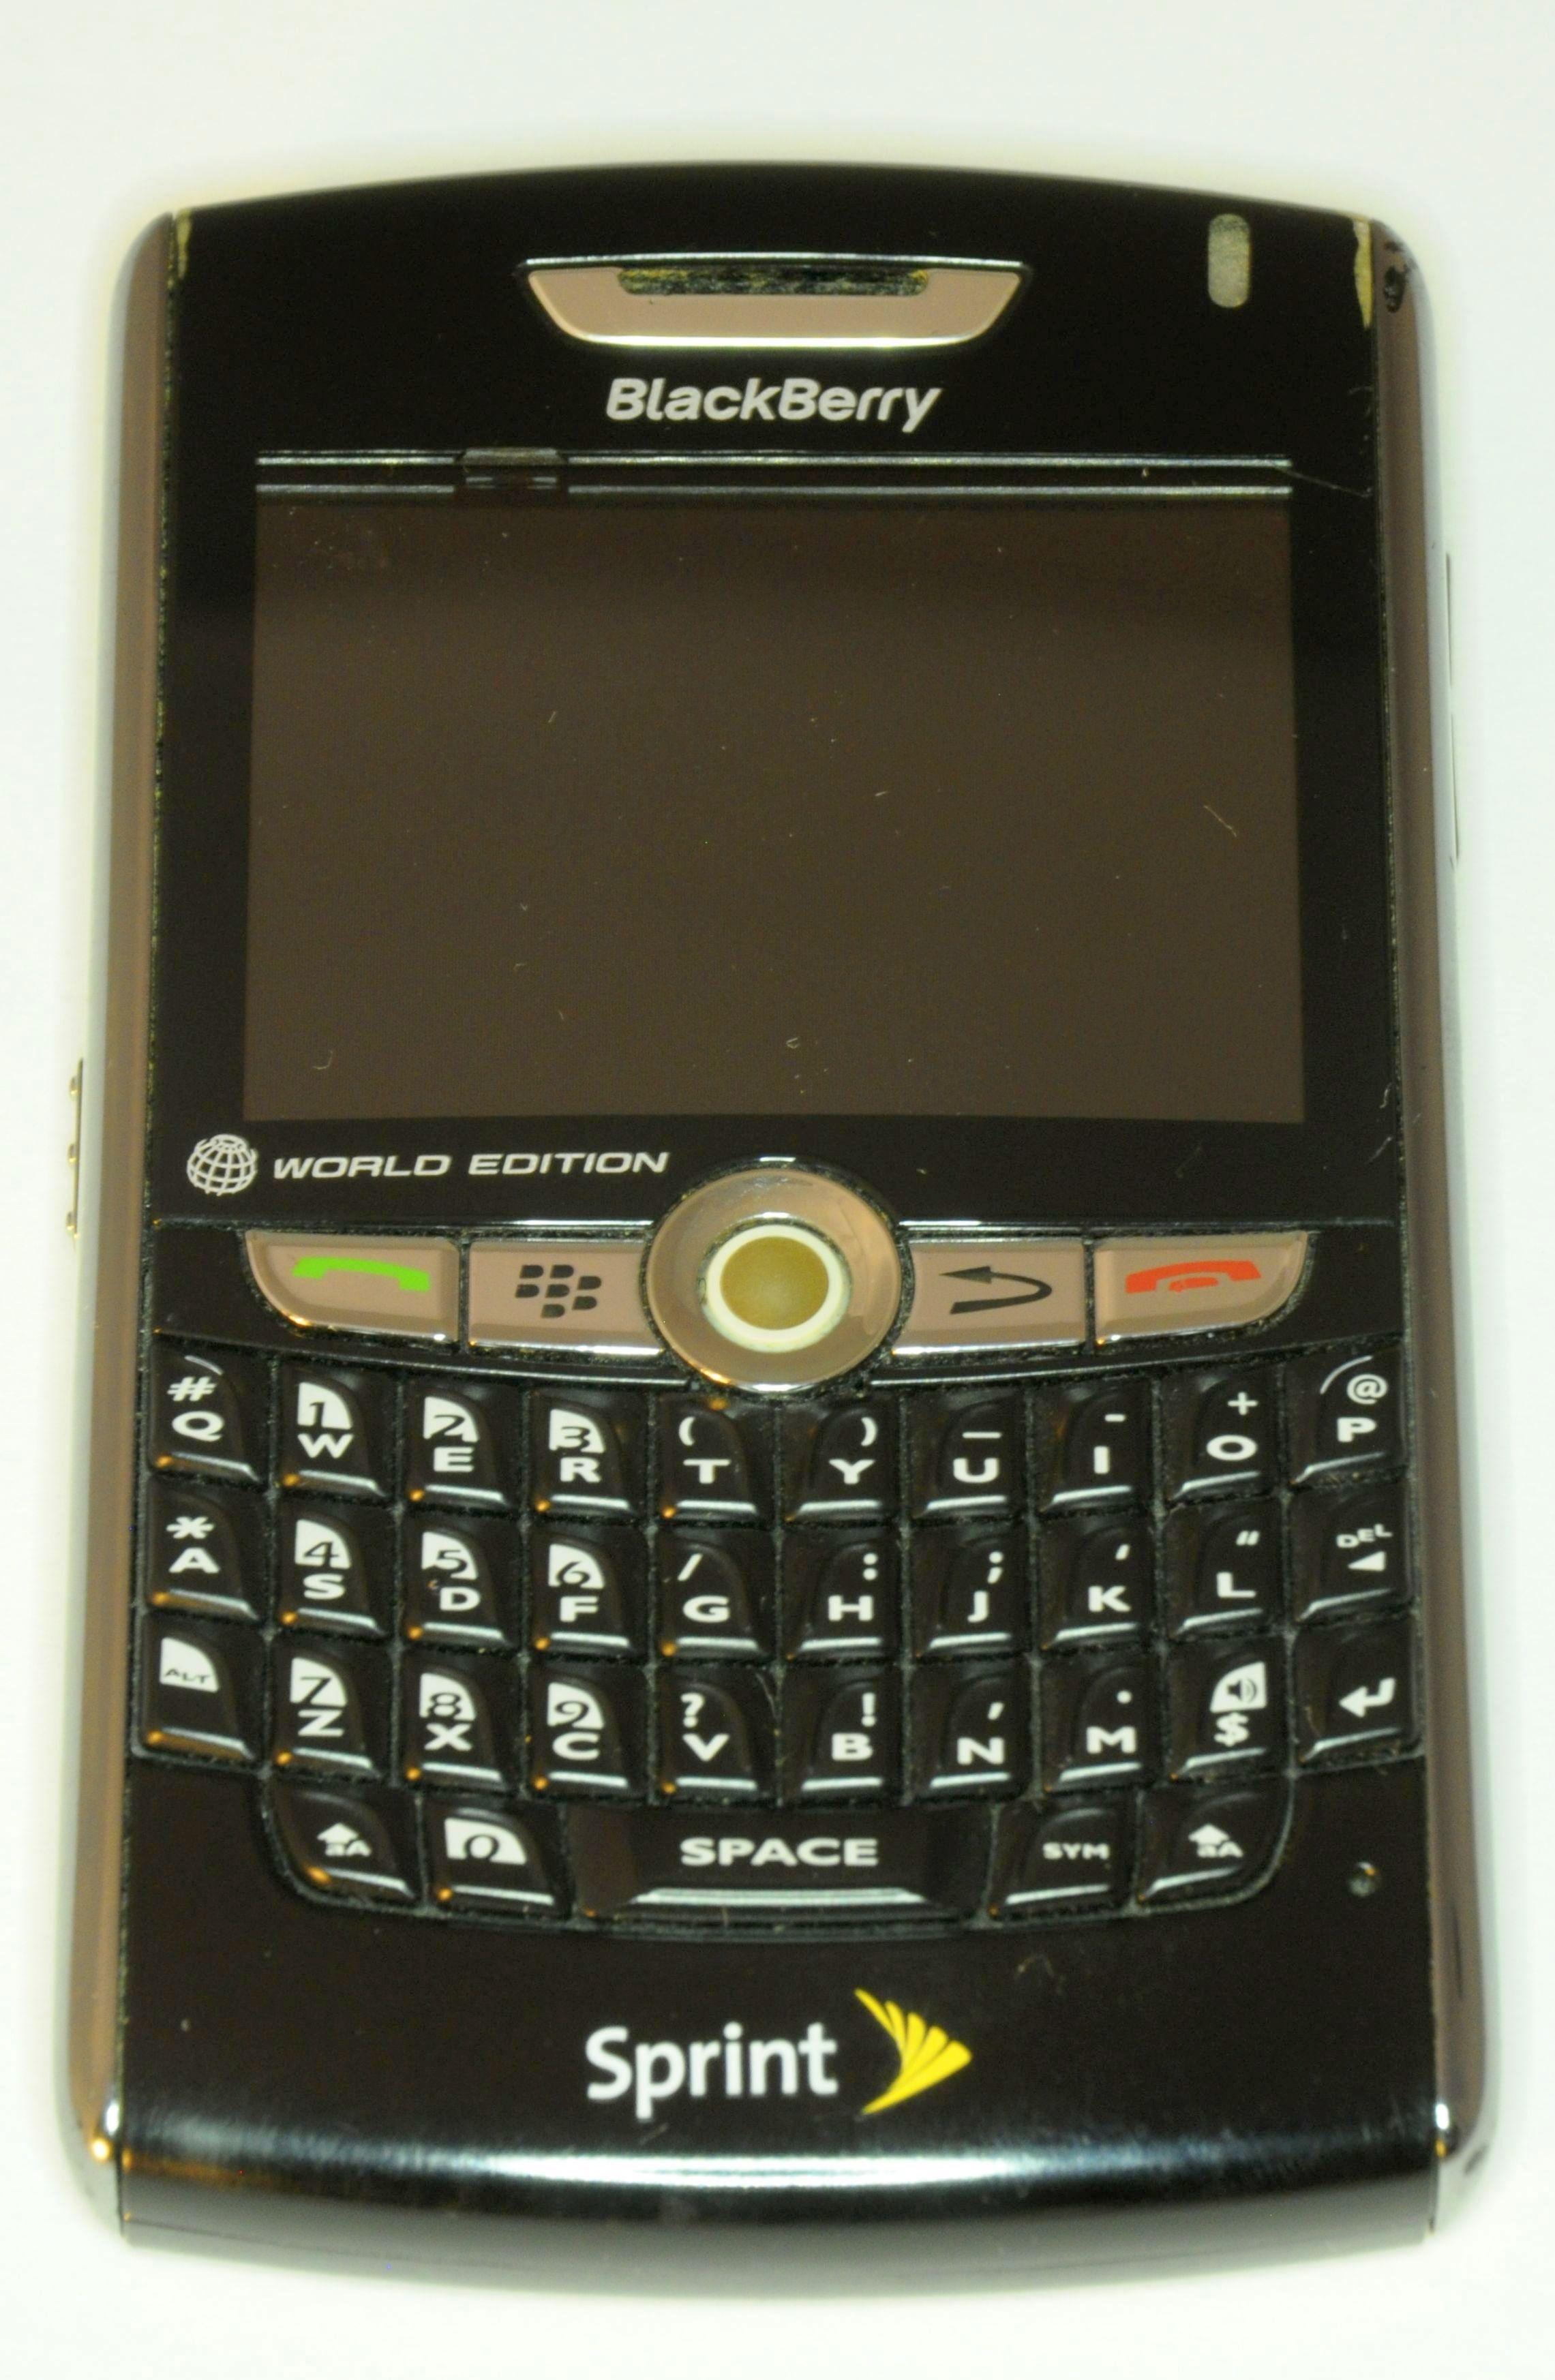 file blackberry 8830 jpg wikimedia commons rh commons wikimedia org BlackBerry 9650 BlackBerry 8810